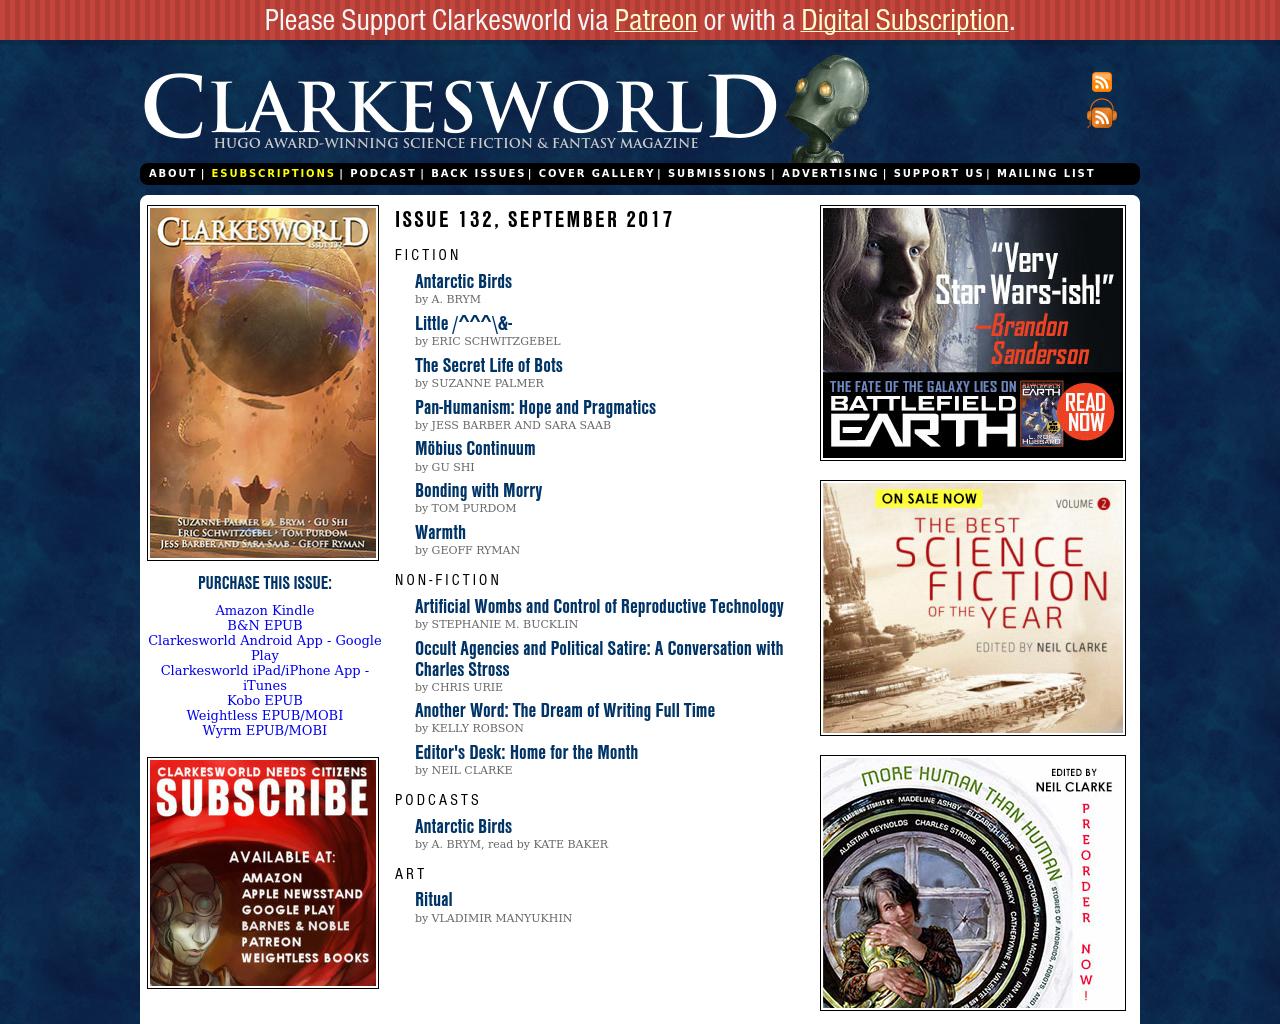 Clarkesworld-Magazine-Advertising-Reviews-Pricing